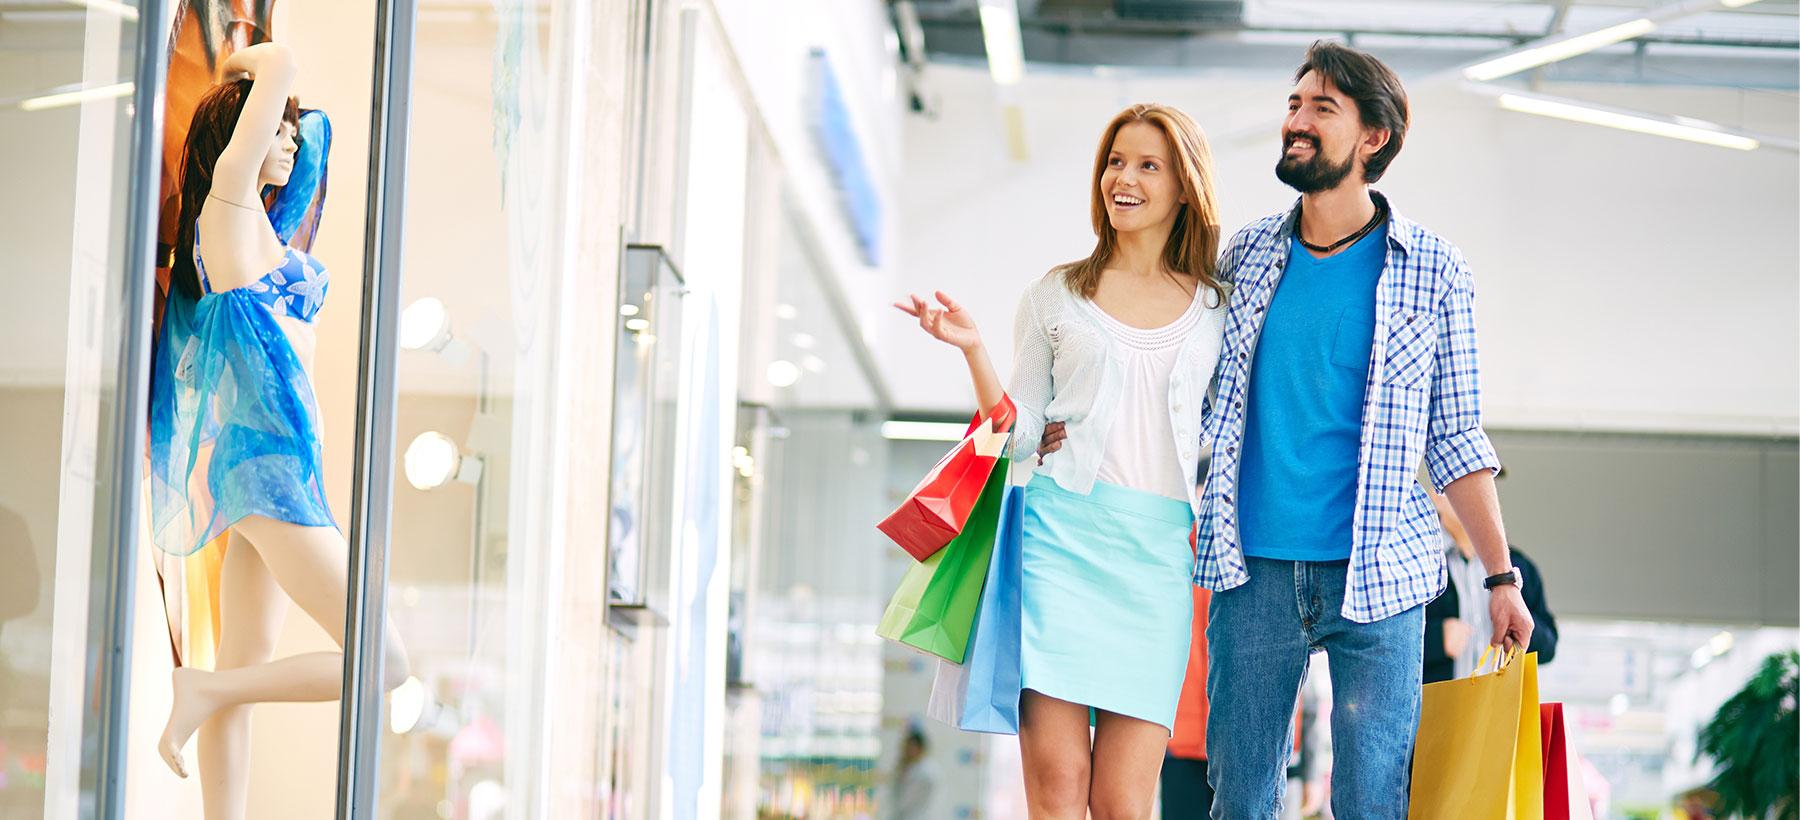 talético rivoluziona il retail